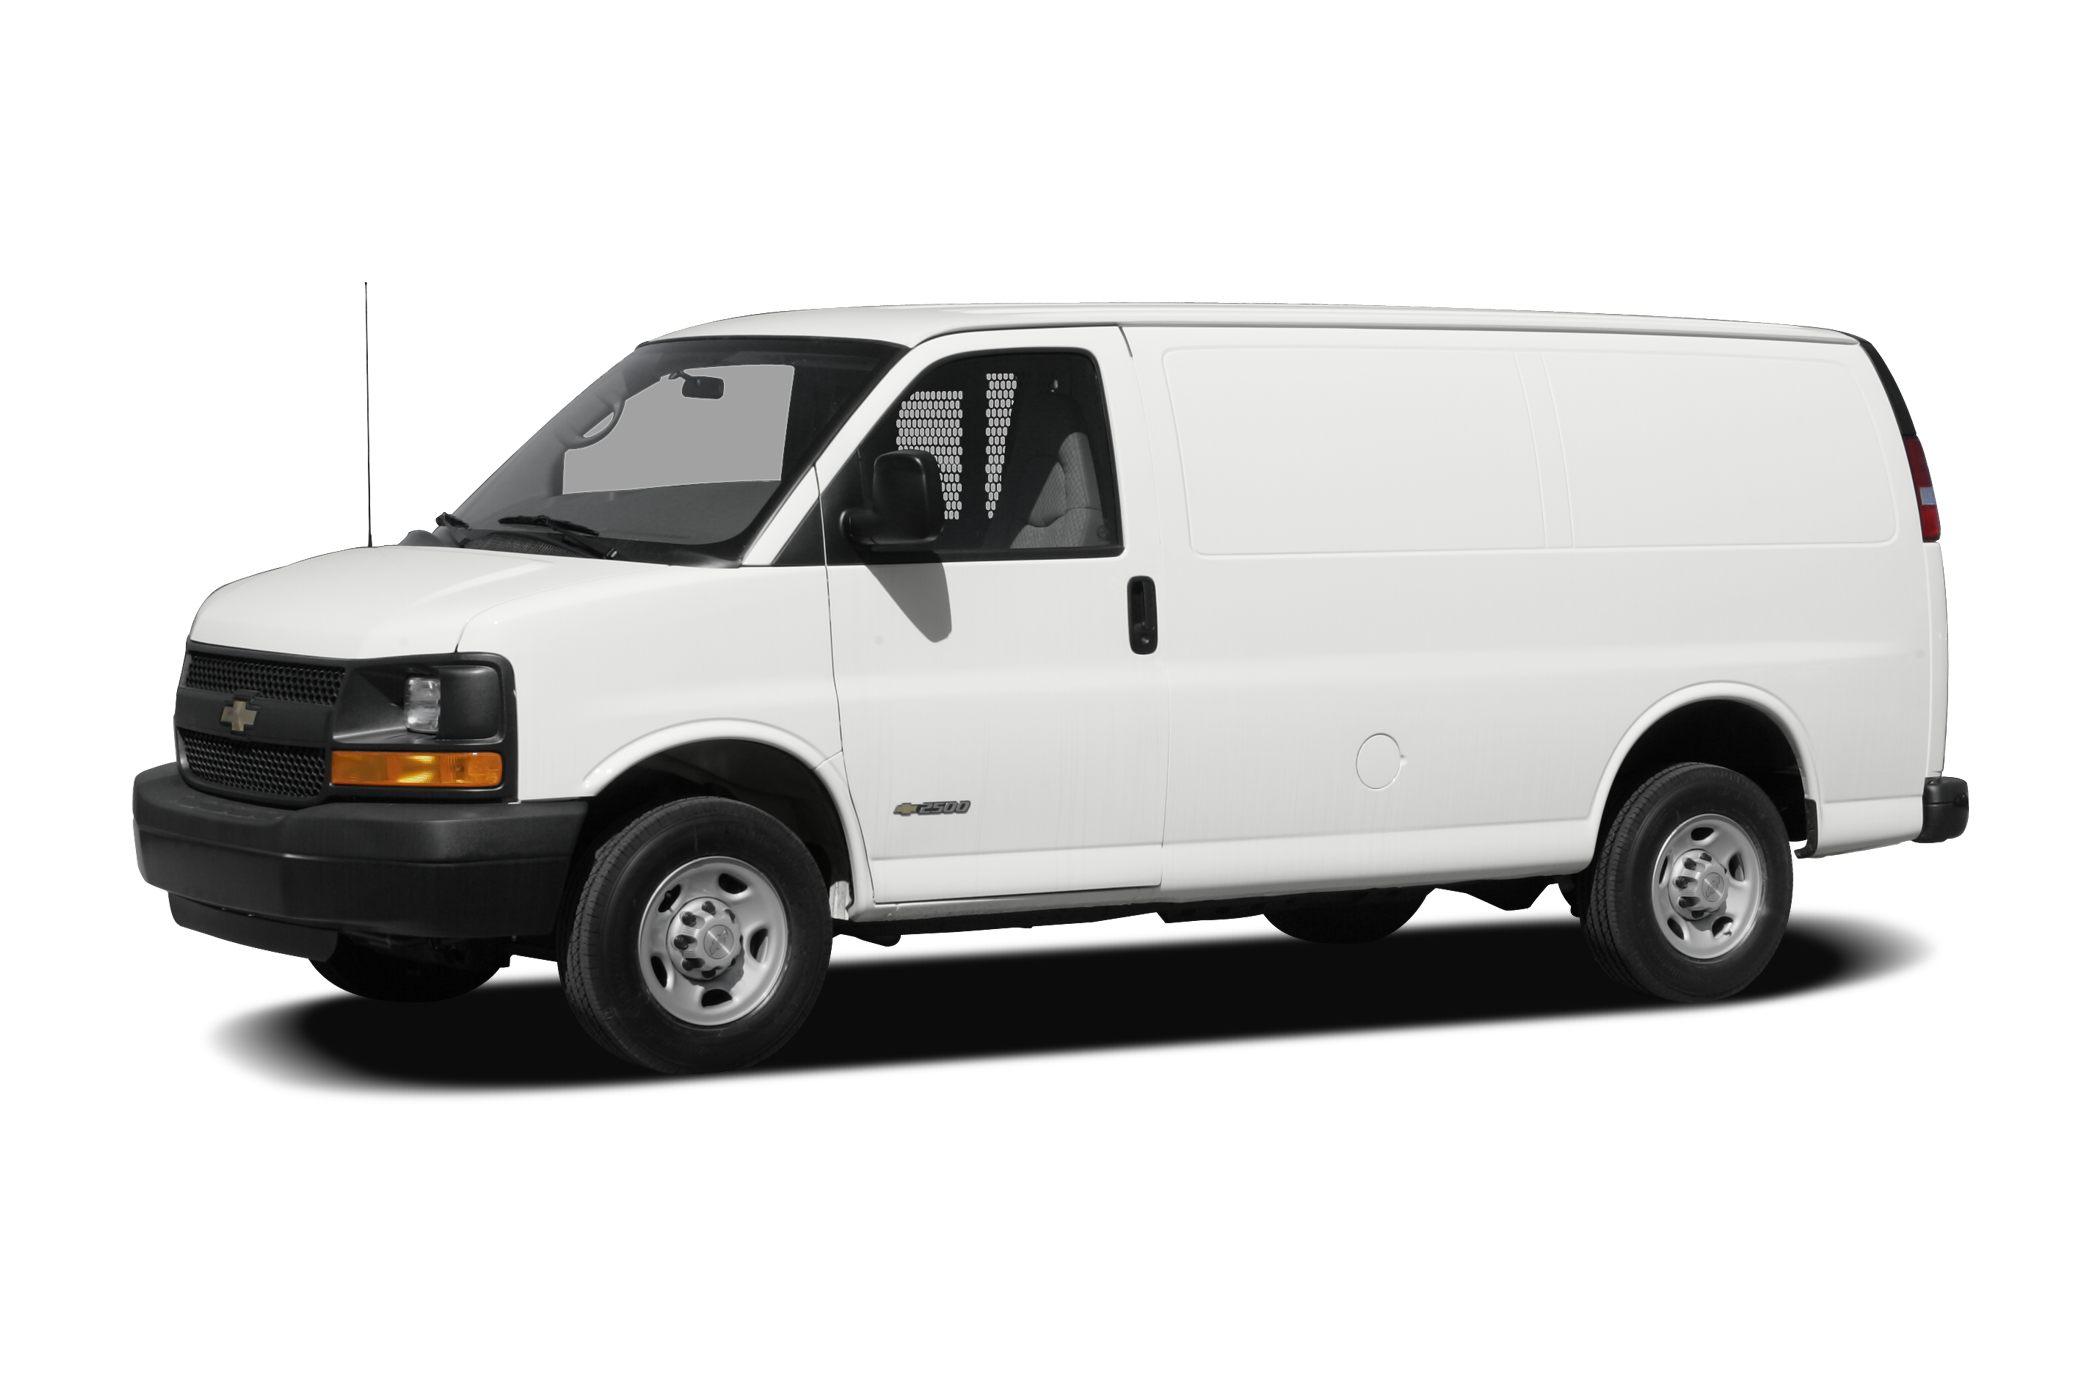 2010 Chevrolet Express 2500 Work Van Rear Wheel Drive Cargo